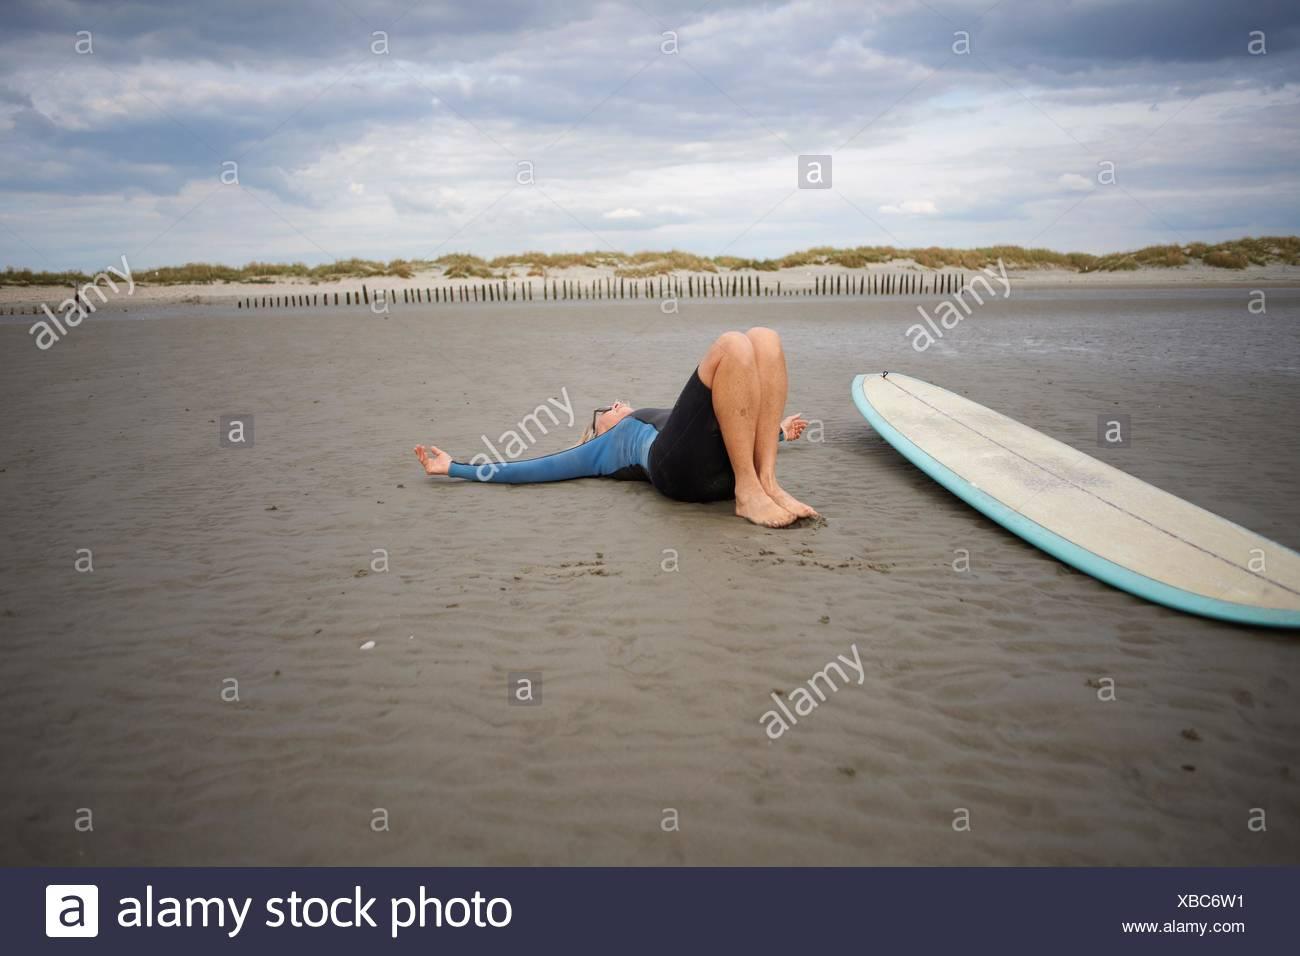 Senior woman relaxing on sand, surfboard beside her - Stock Image